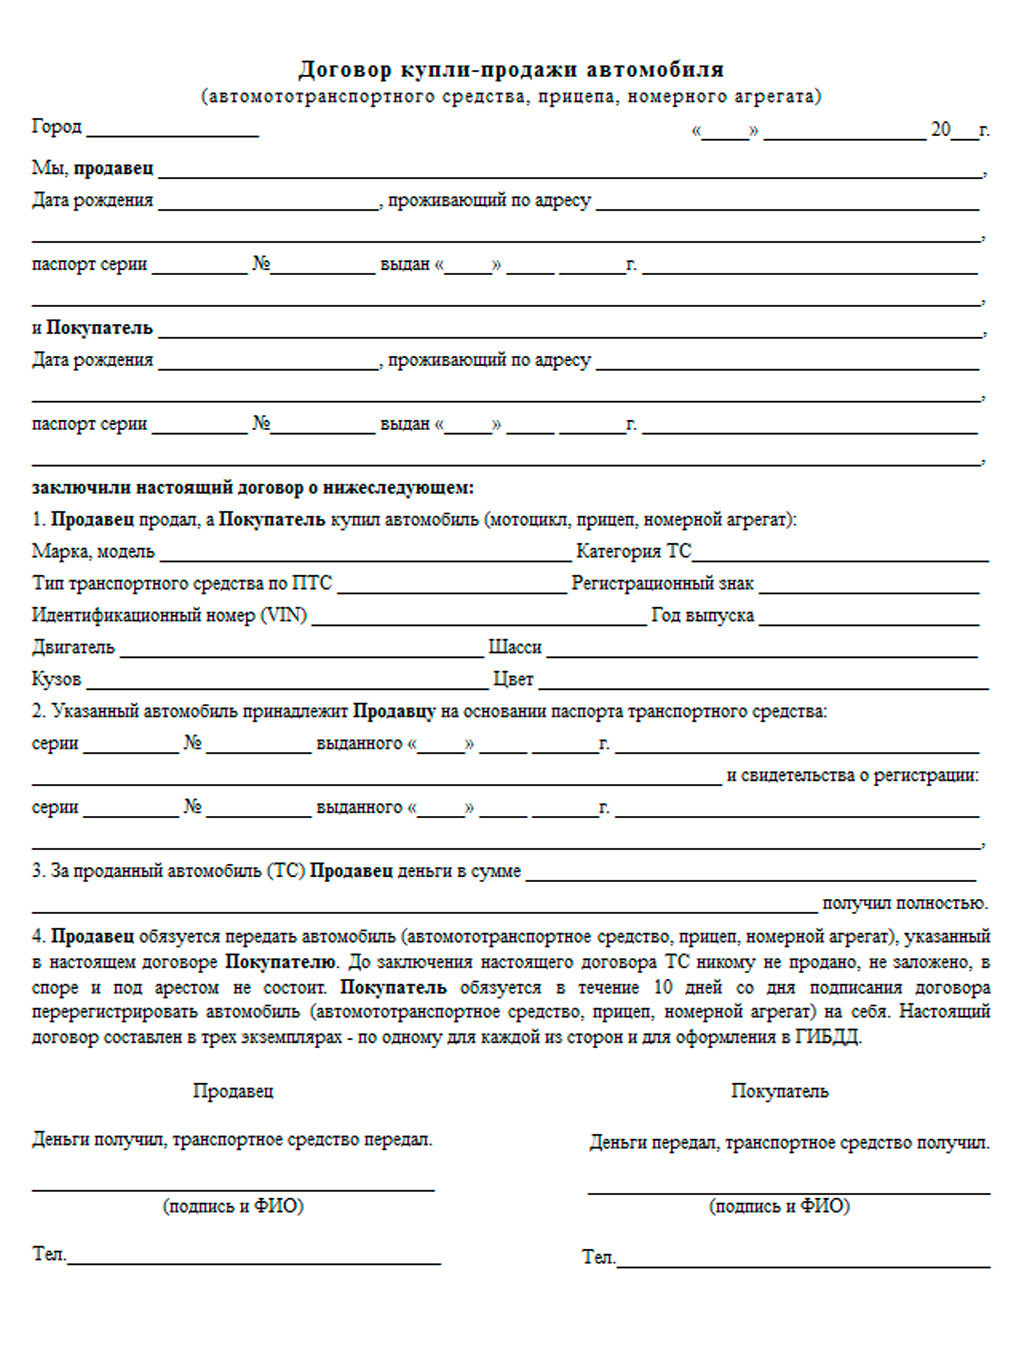 Автоломбард Продажа автомобилей - Автоломбард в Москве